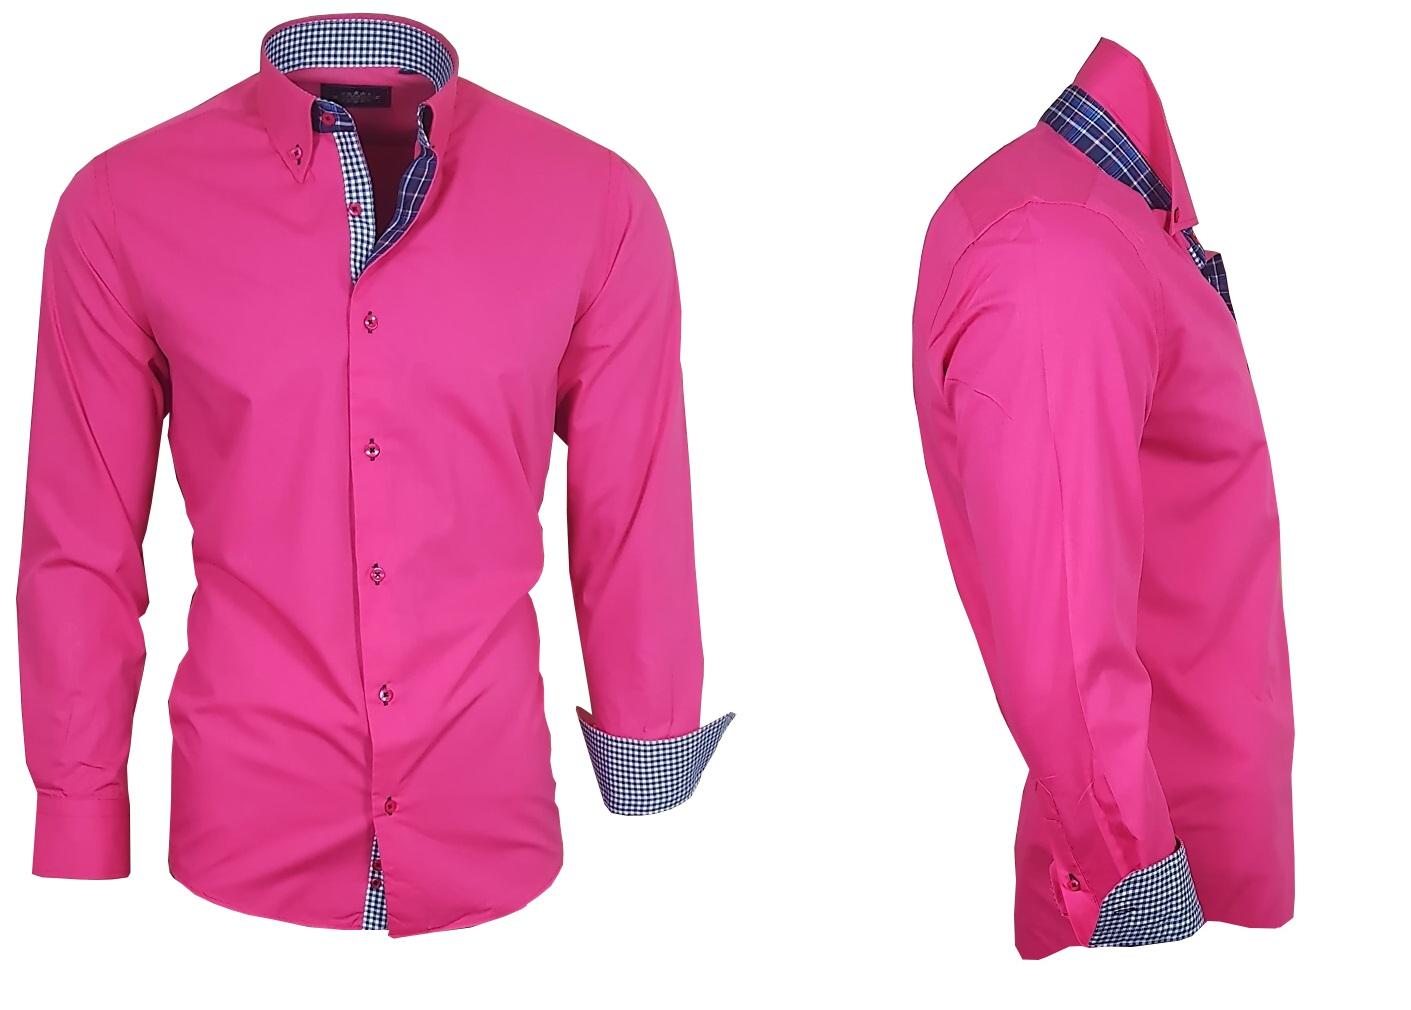 Camisa-para-hombre-camisa-manga-larga-camisa-Ober-camisa-viga-reticulada-de-Luxe-magenta-rosa-82310